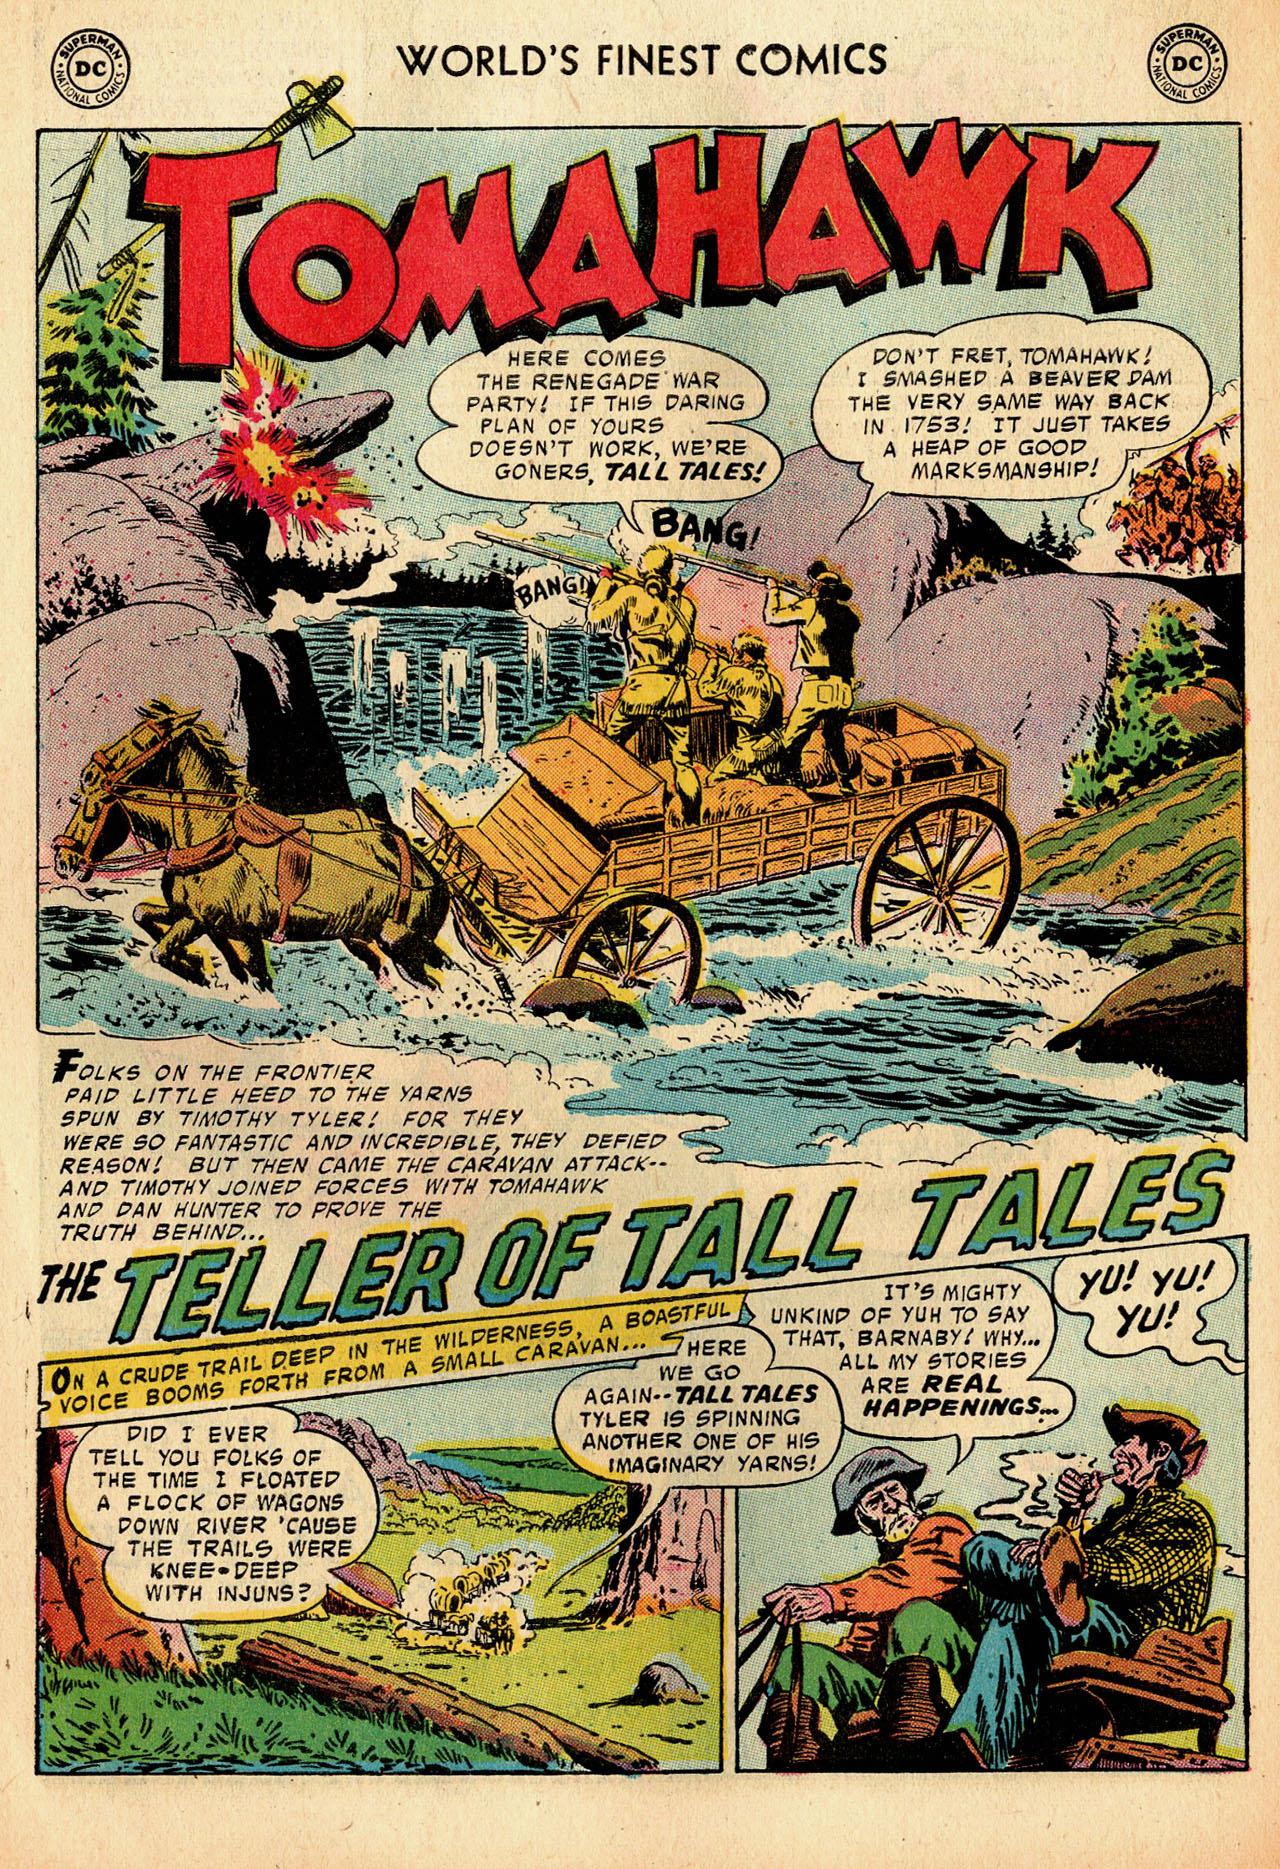 Read online World's Finest Comics comic -  Issue #91 - 28